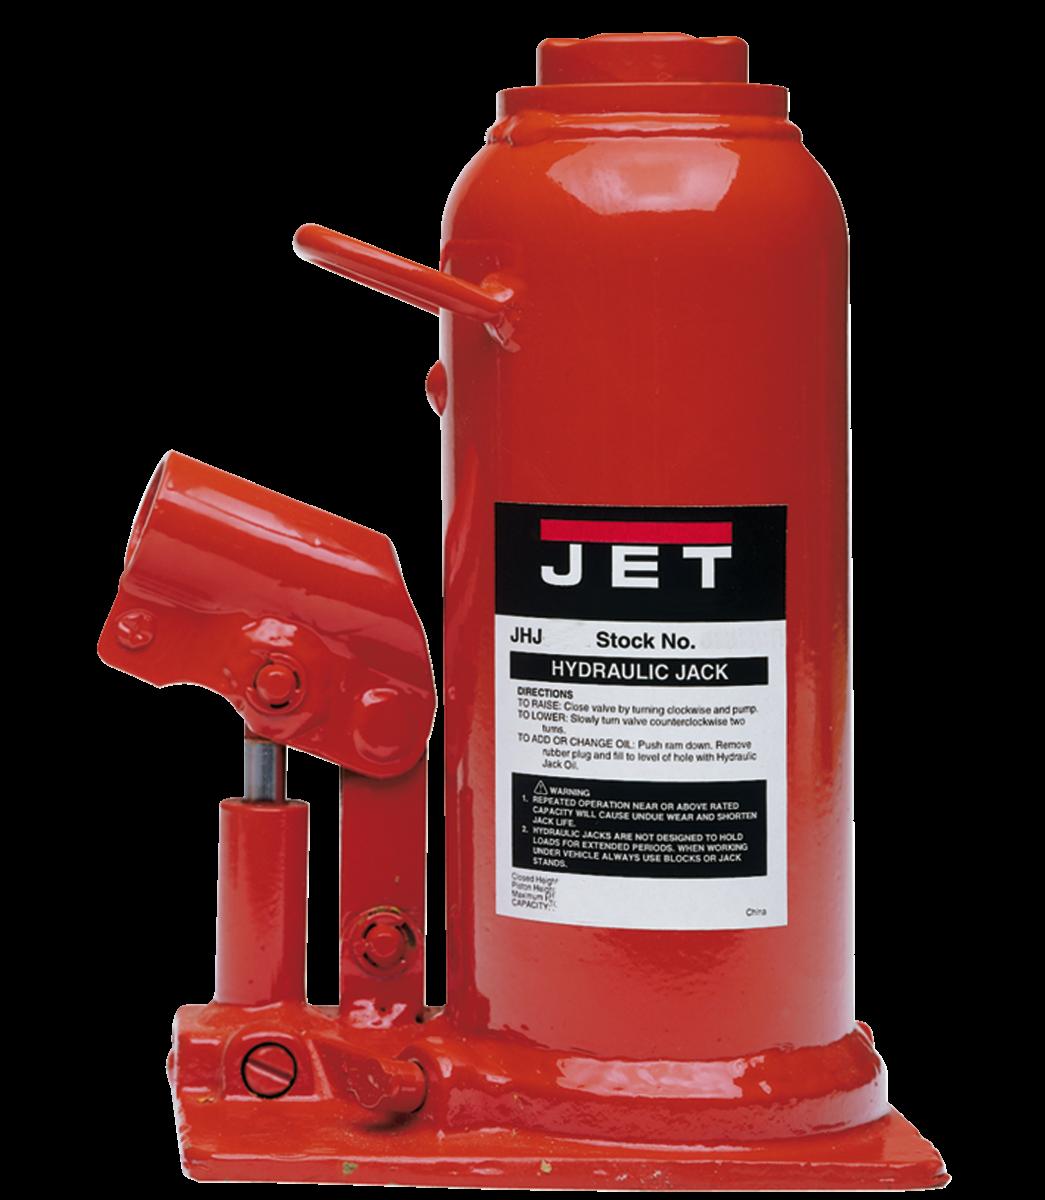 JHJ-3, 3-Ton Hydraulic Bottle Jack